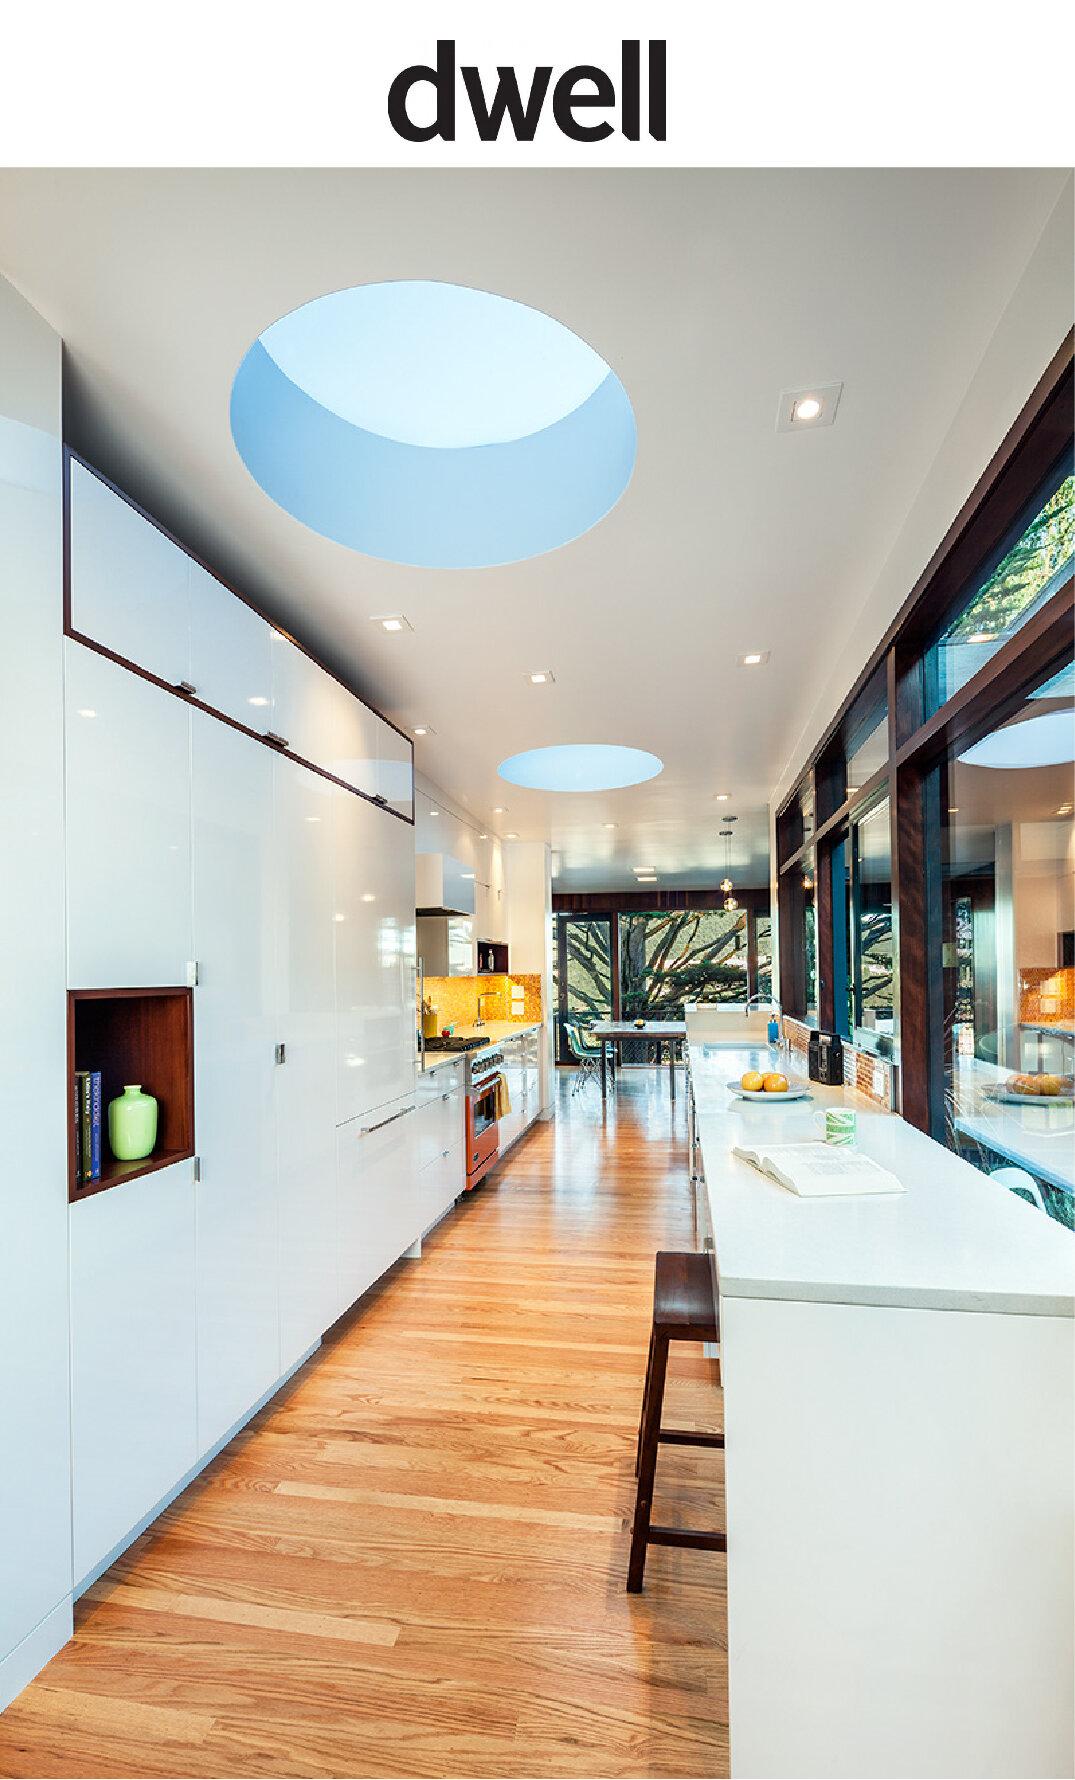 DWELL magazine - Bright Lights, Big Kitchen